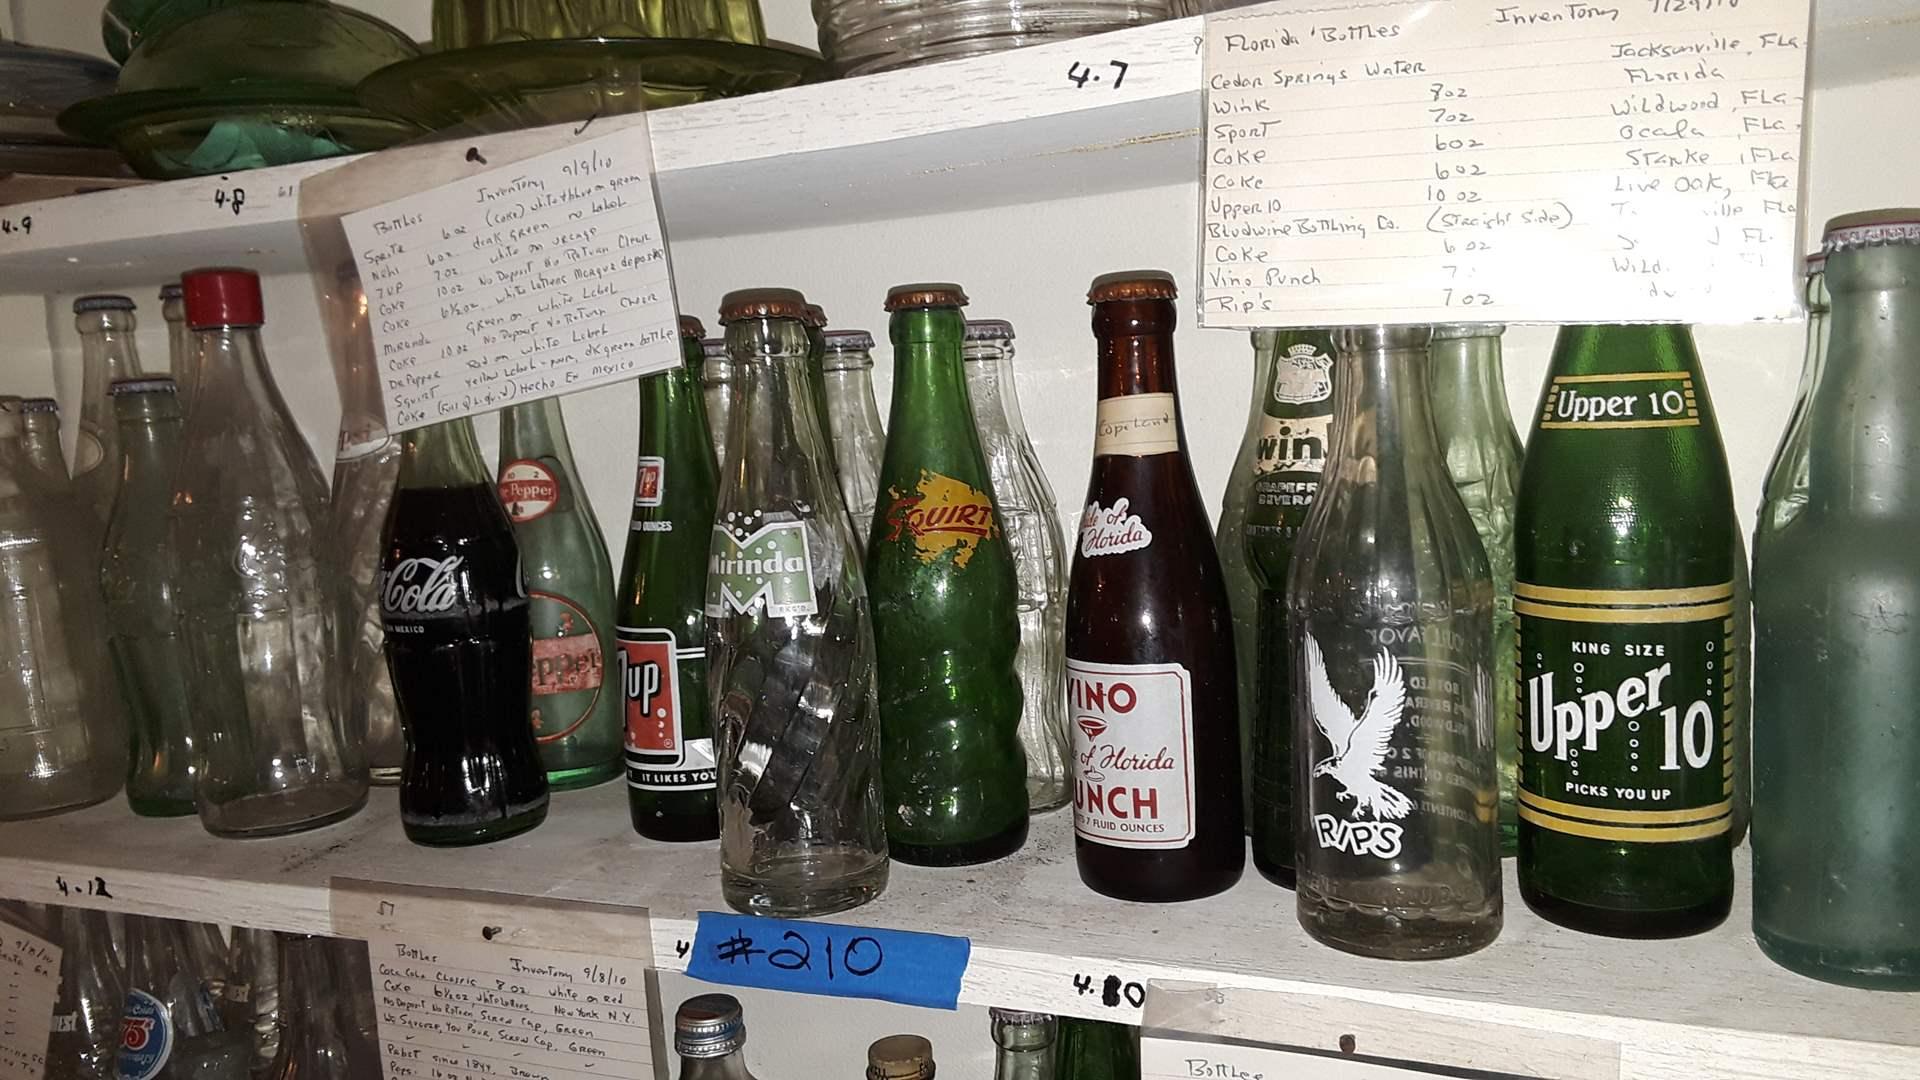 Lot # 210 COLLECTIBLE SODA BOTTLES,  VINO PUNCH FL, UPPER 10, SQUIRT